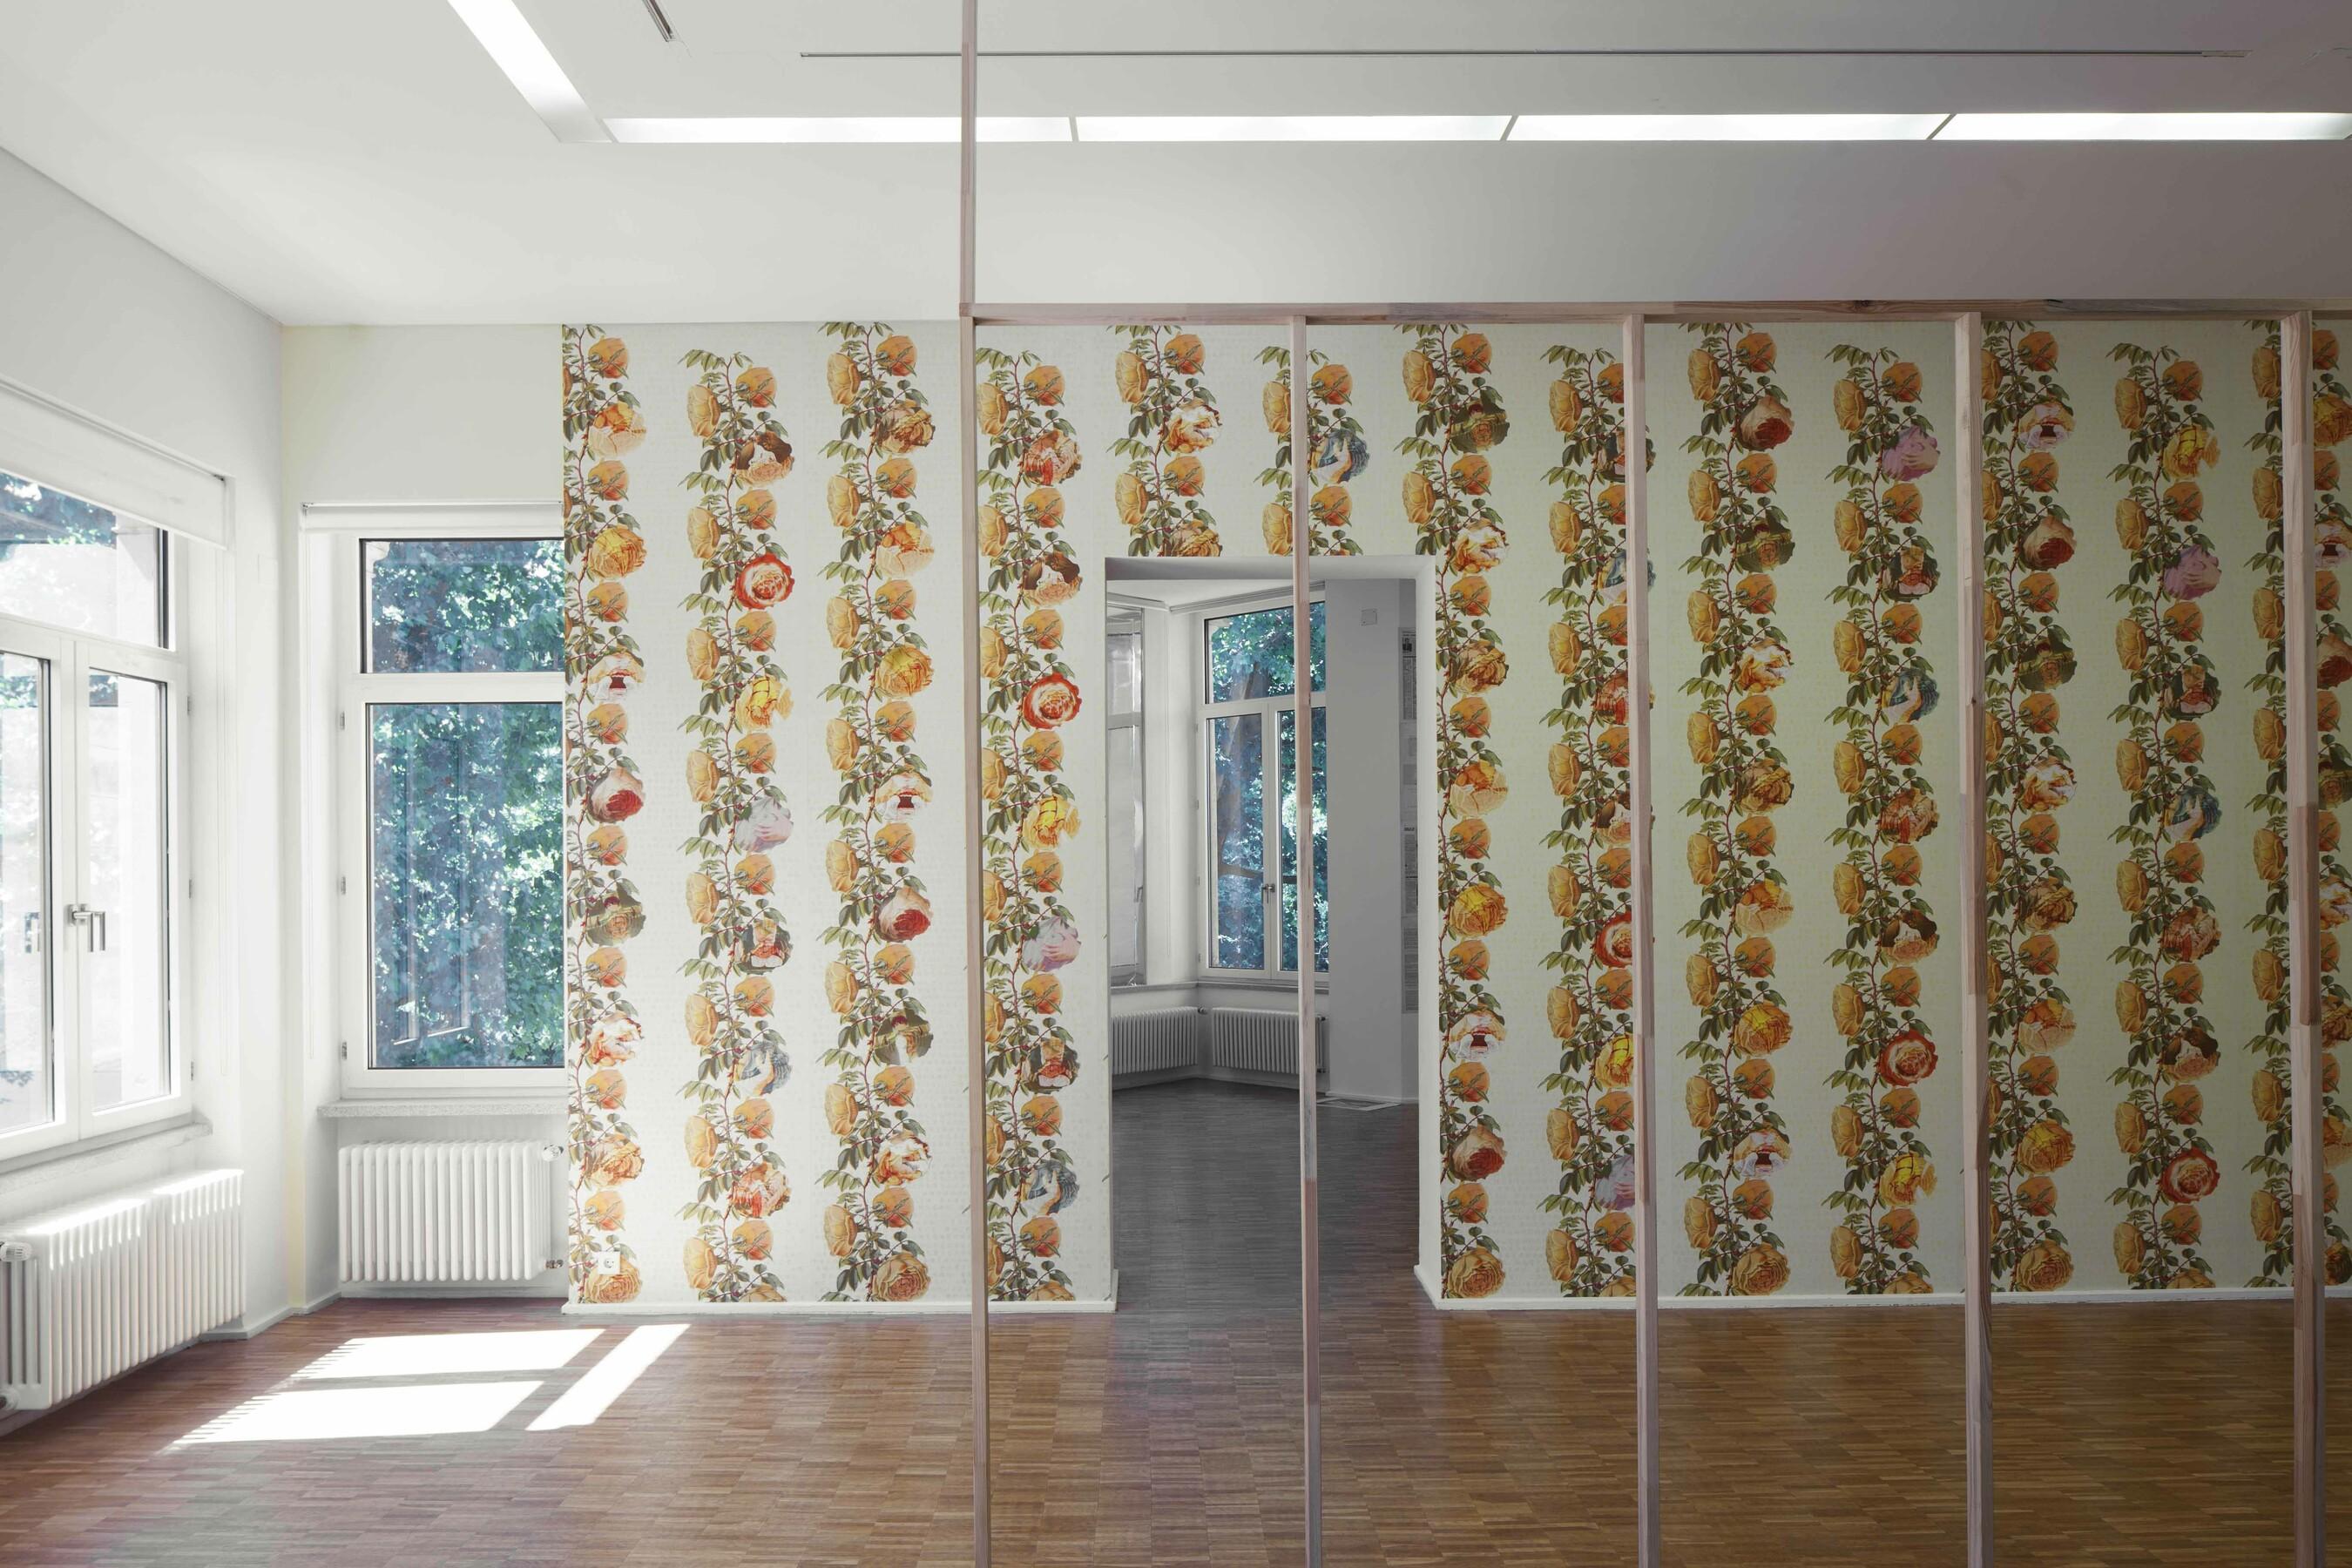 Pass-Stücke, Ausstellungsansicht, ©GfZK